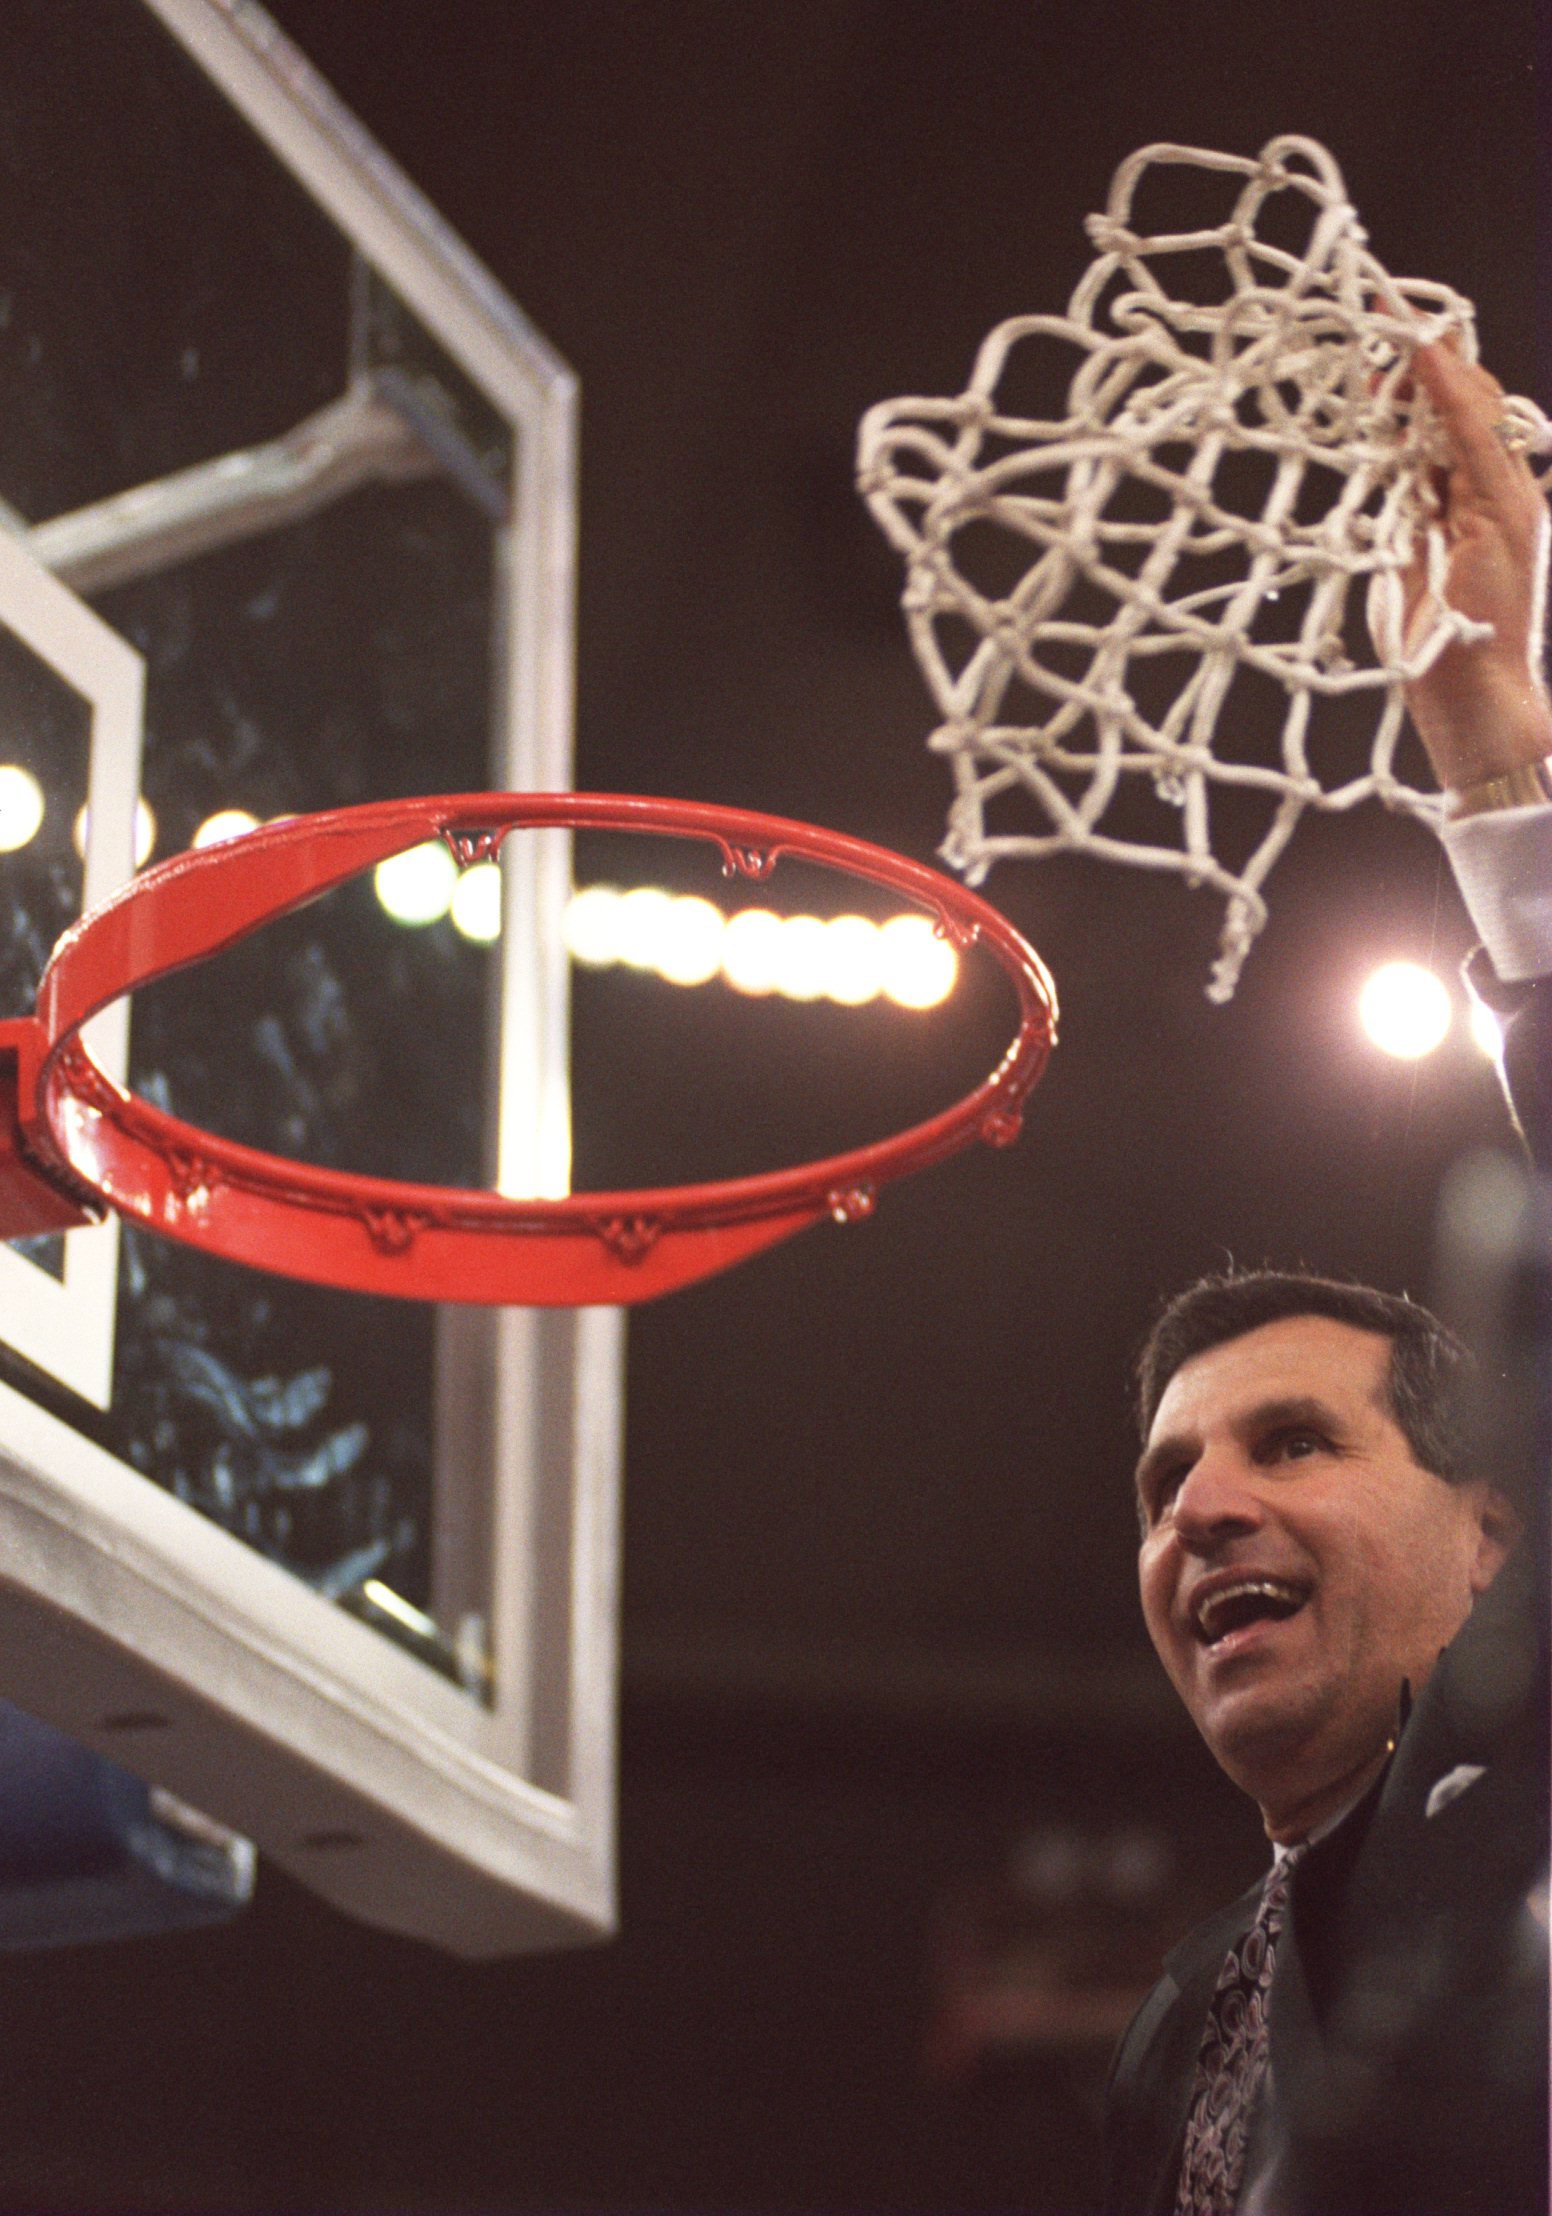 3 APR 1995:  UCLA  COACH JIM HARRICK CELEBRATES AFTER DEFEATING ARKANSAS 89-78 IN THE NCAA MEN''S BASKETBALL CHAMPIONSHIP TONIGHT AT THE KINGDOME IN SEATTLE, WASHINGTON.    Mandatory Credit: Stephen Dunn/ALLSPORT